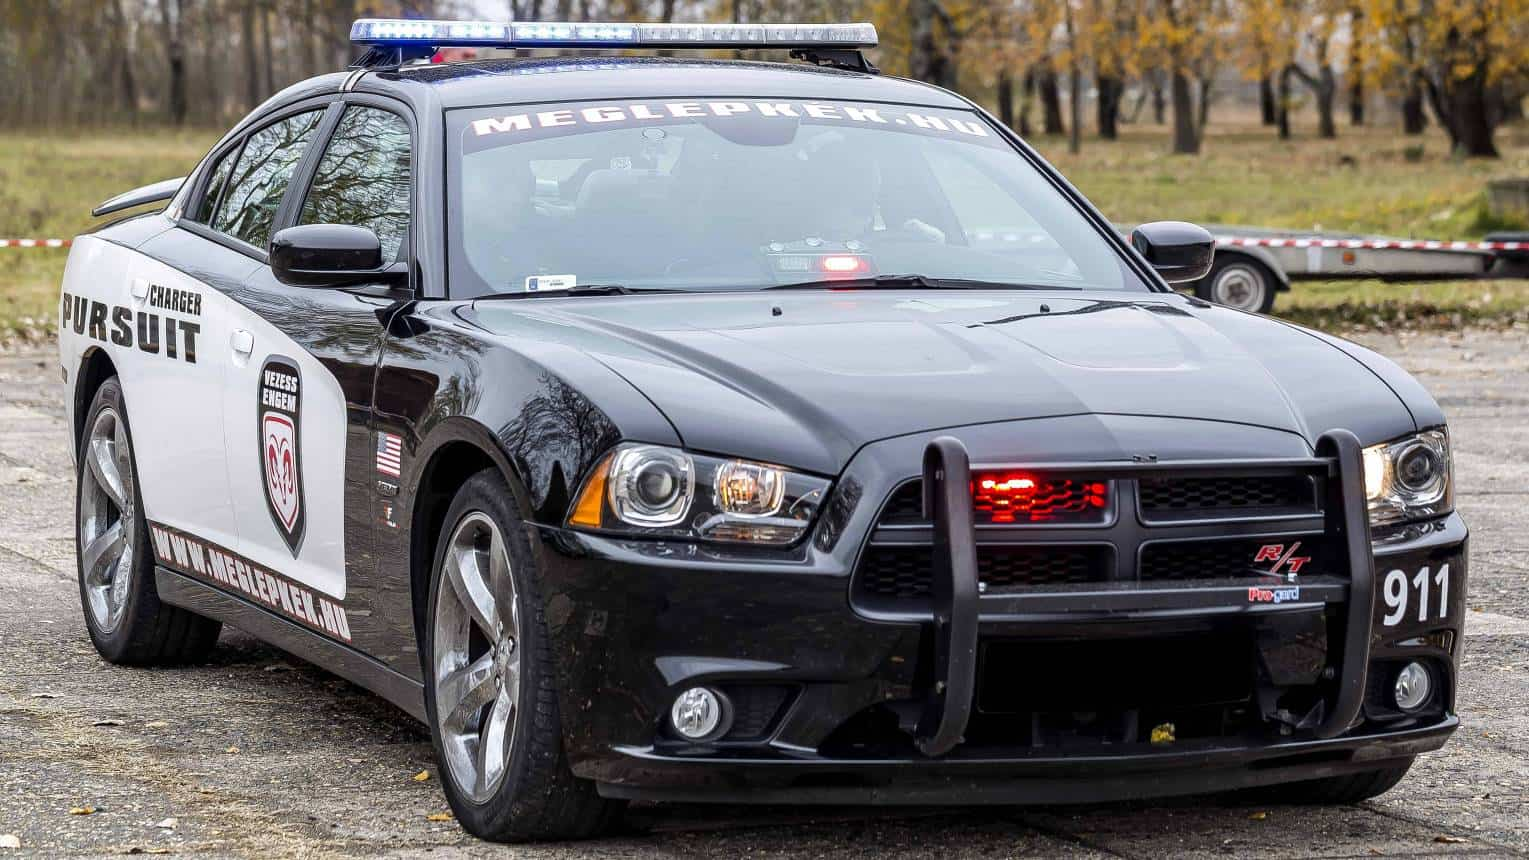 Dodge Charger Need for Speed rendőrautó vezetés a DRX-ringen